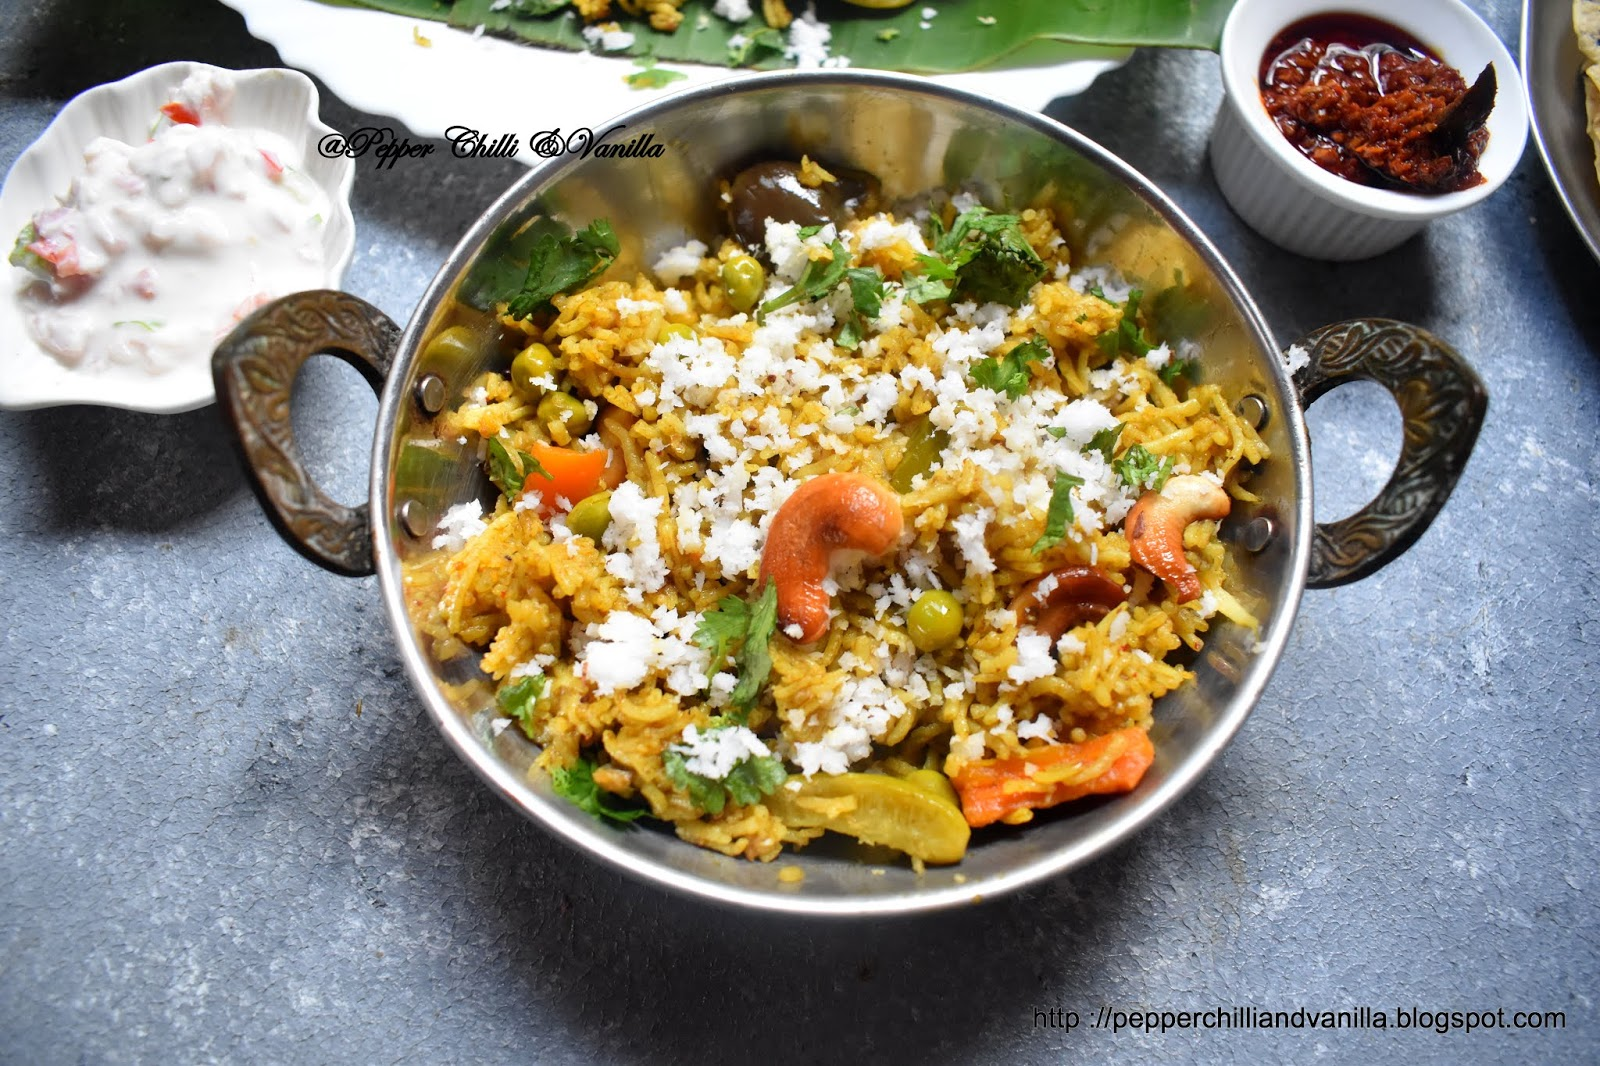 masale bhaat using goda masala